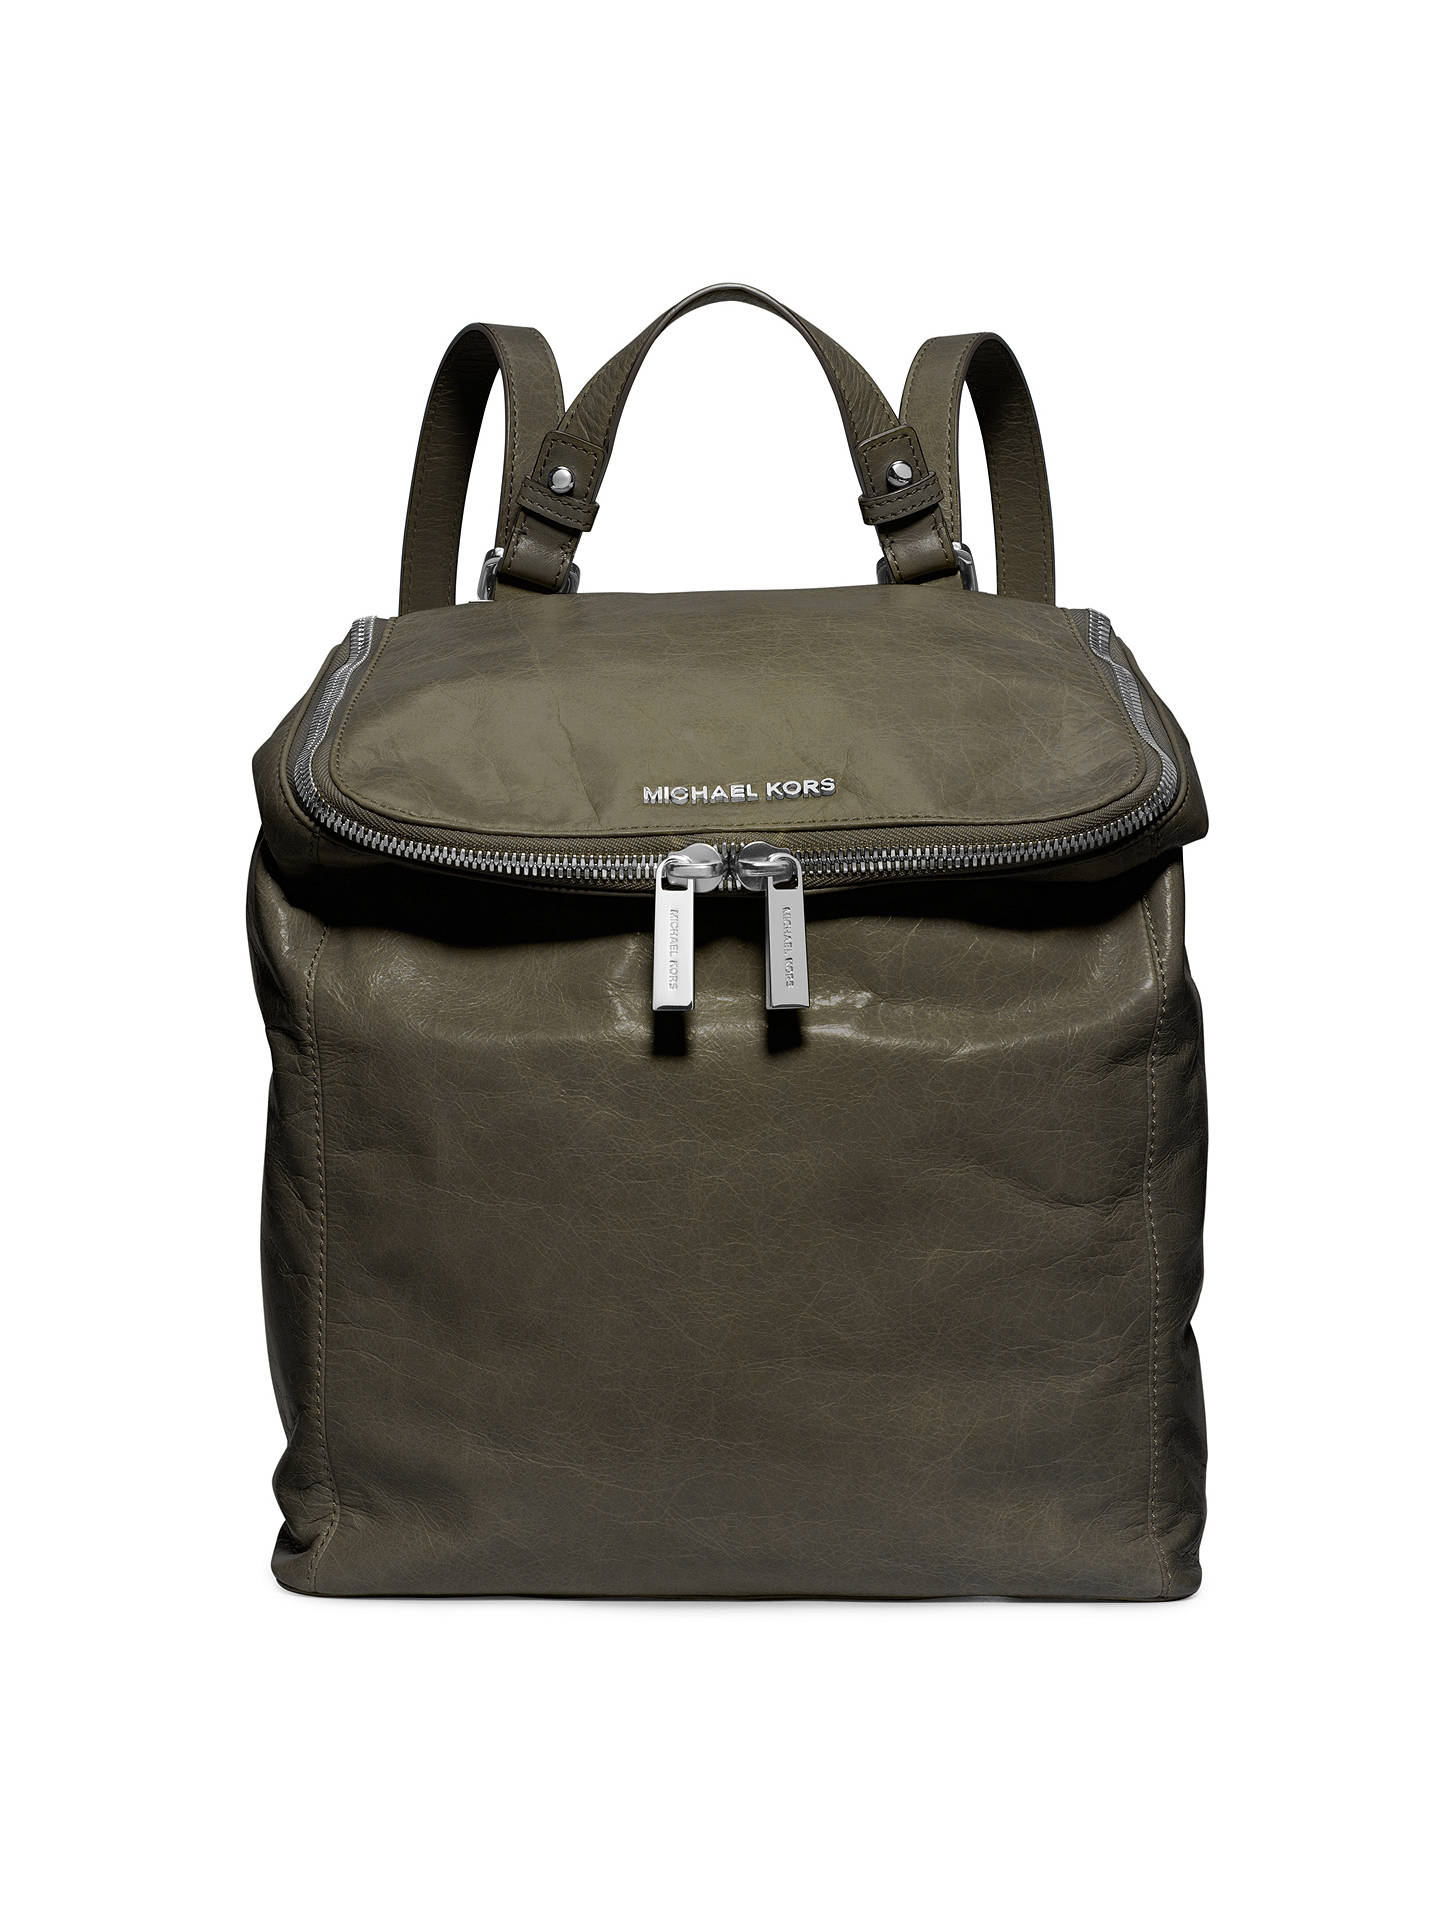 5e0590476155 Buy MICHAEL Michael Kors Medium Lisbeth Leather Backpack, Olive Green  Online at johnlewis.com ...